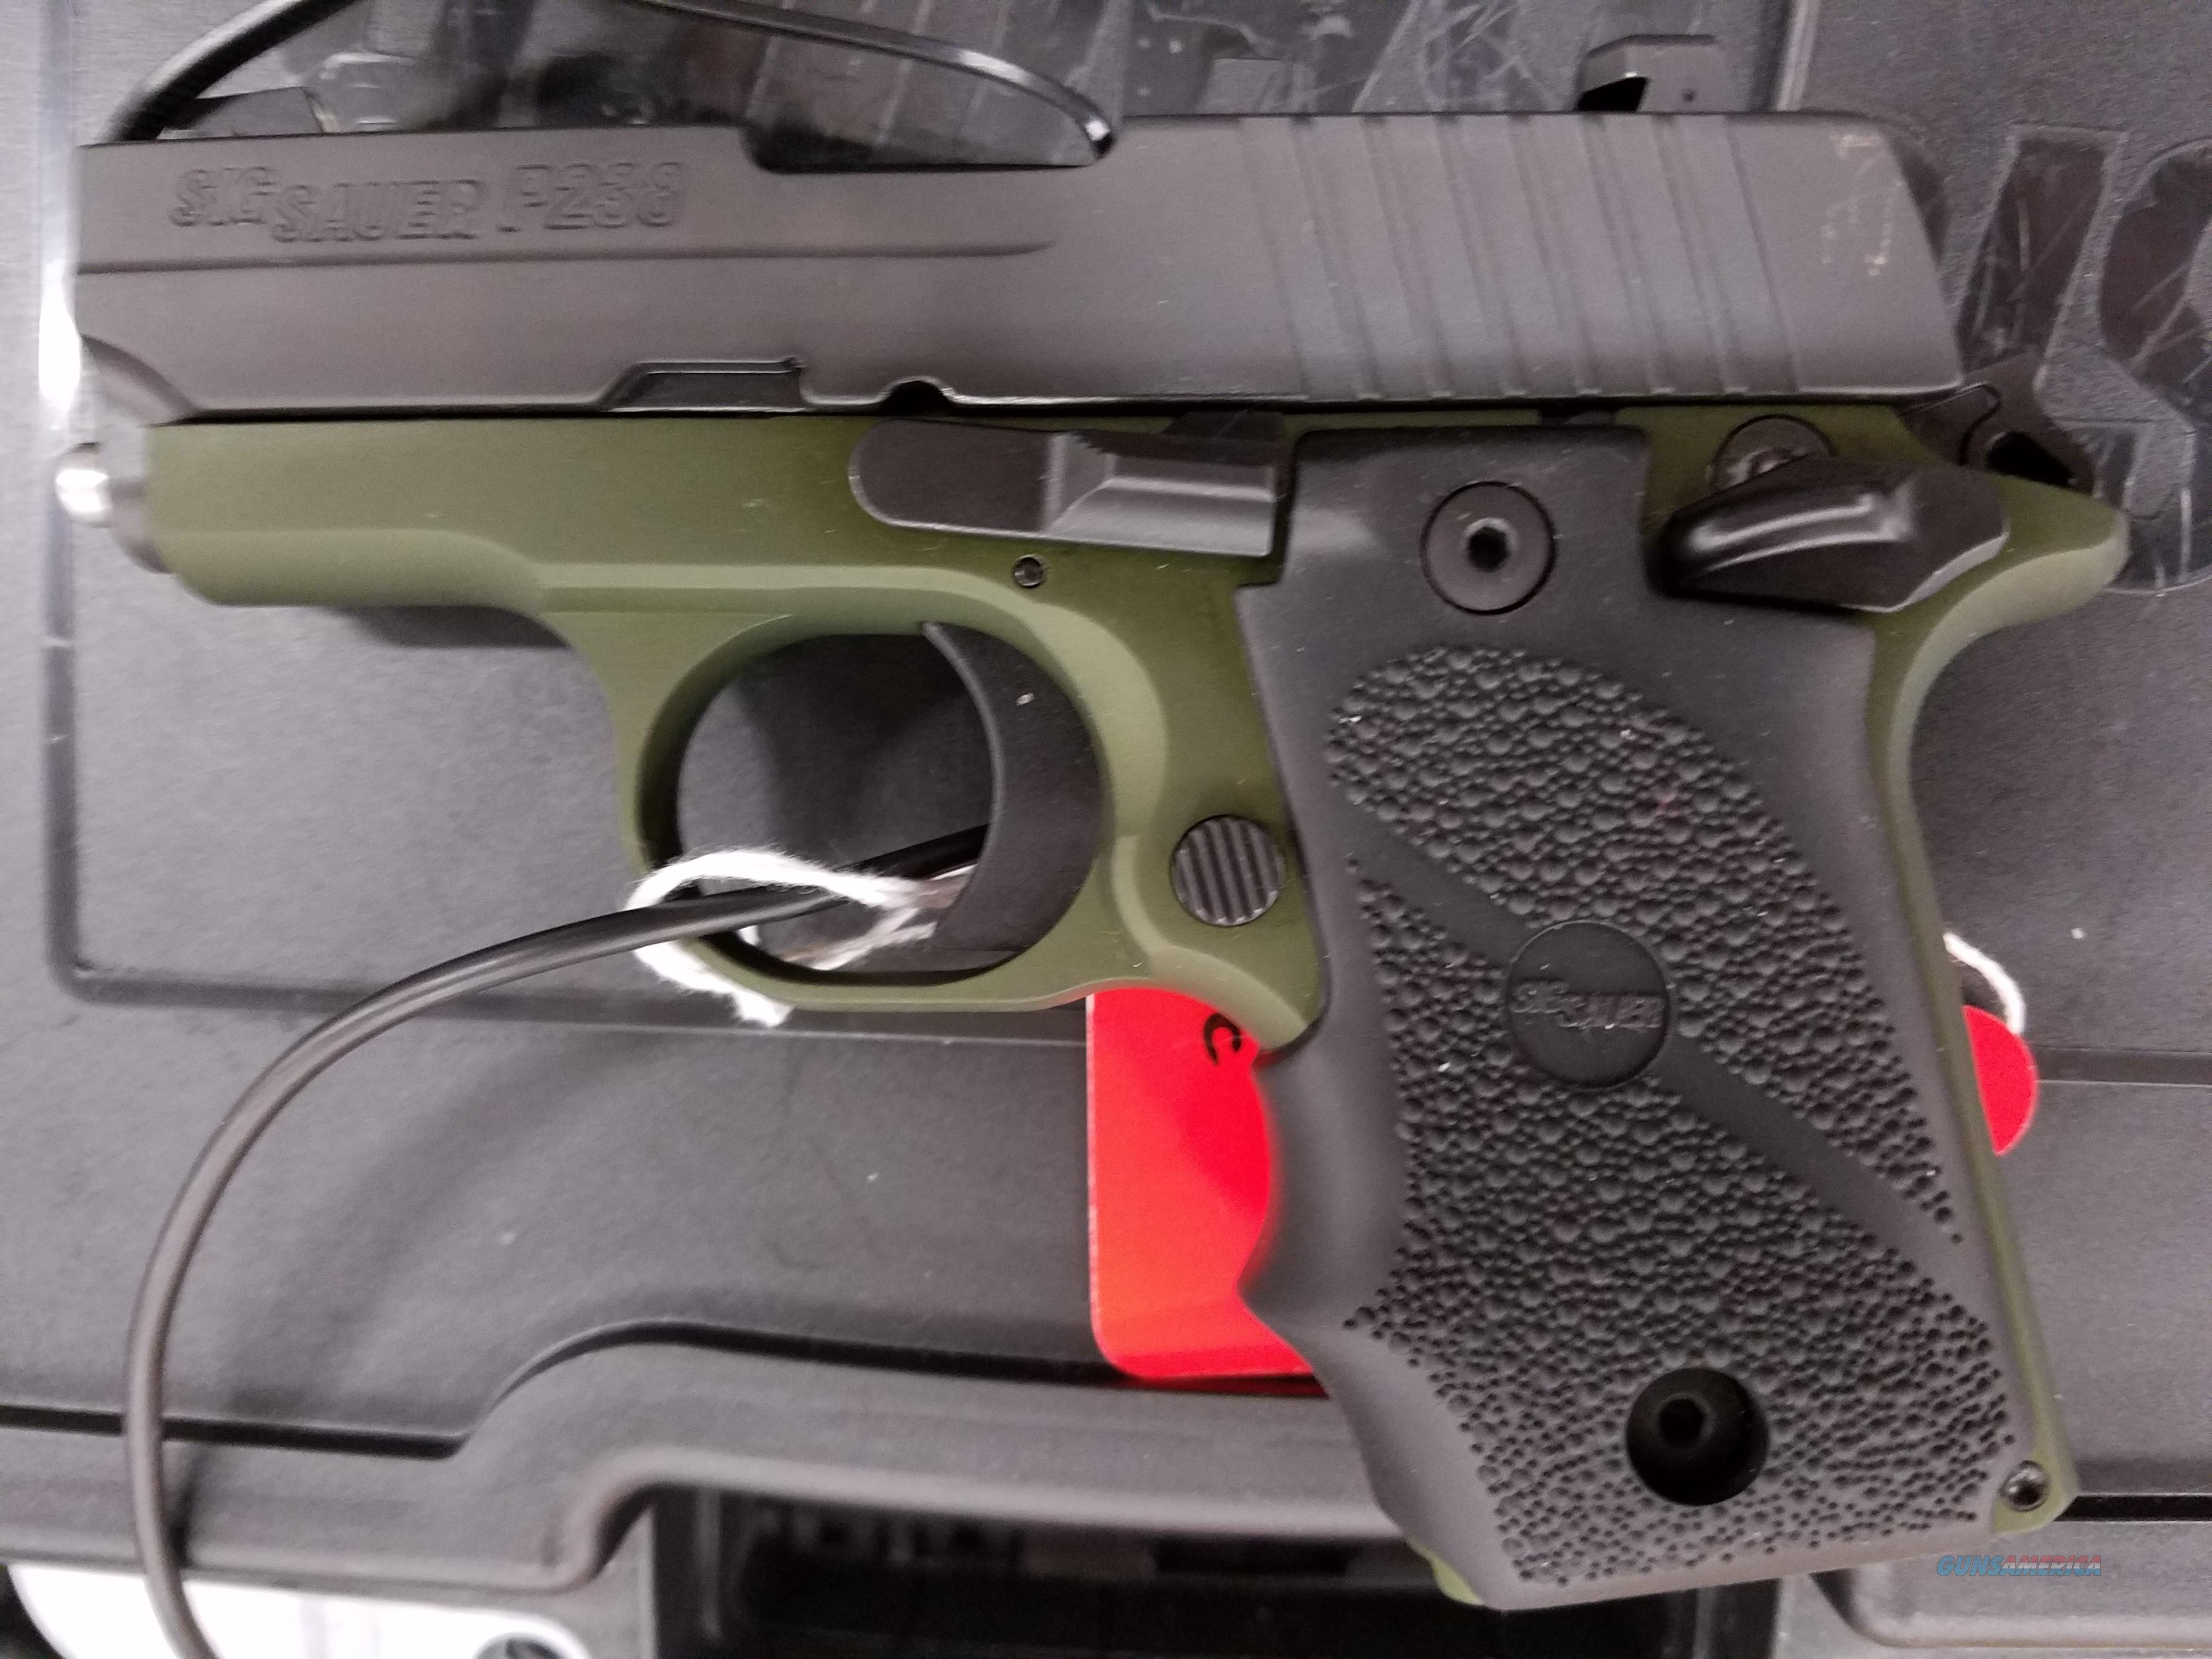 SIG SAUER P238 ARMY  Guns > Pistols > Sig - Sauer/Sigarms Pistols > P238